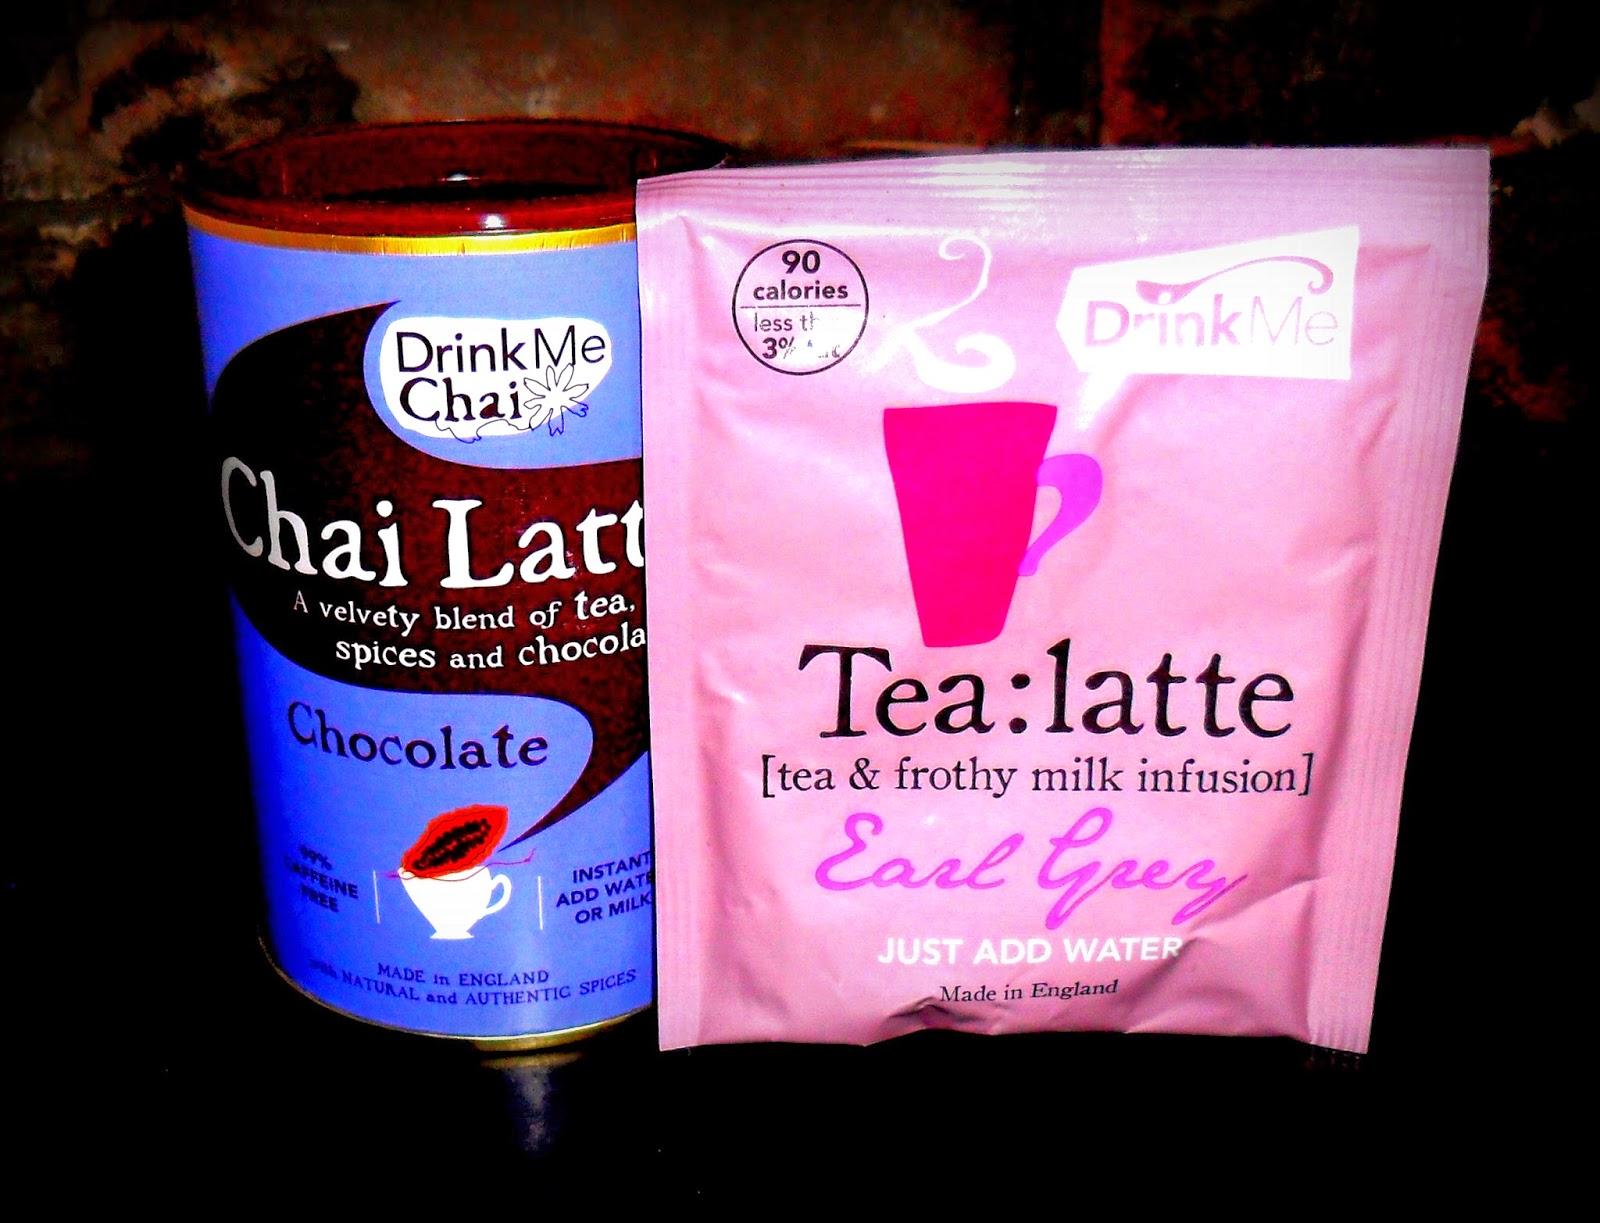 Drink Me Chai, Hot Chocolate, Premium Hot Drinks, Tra